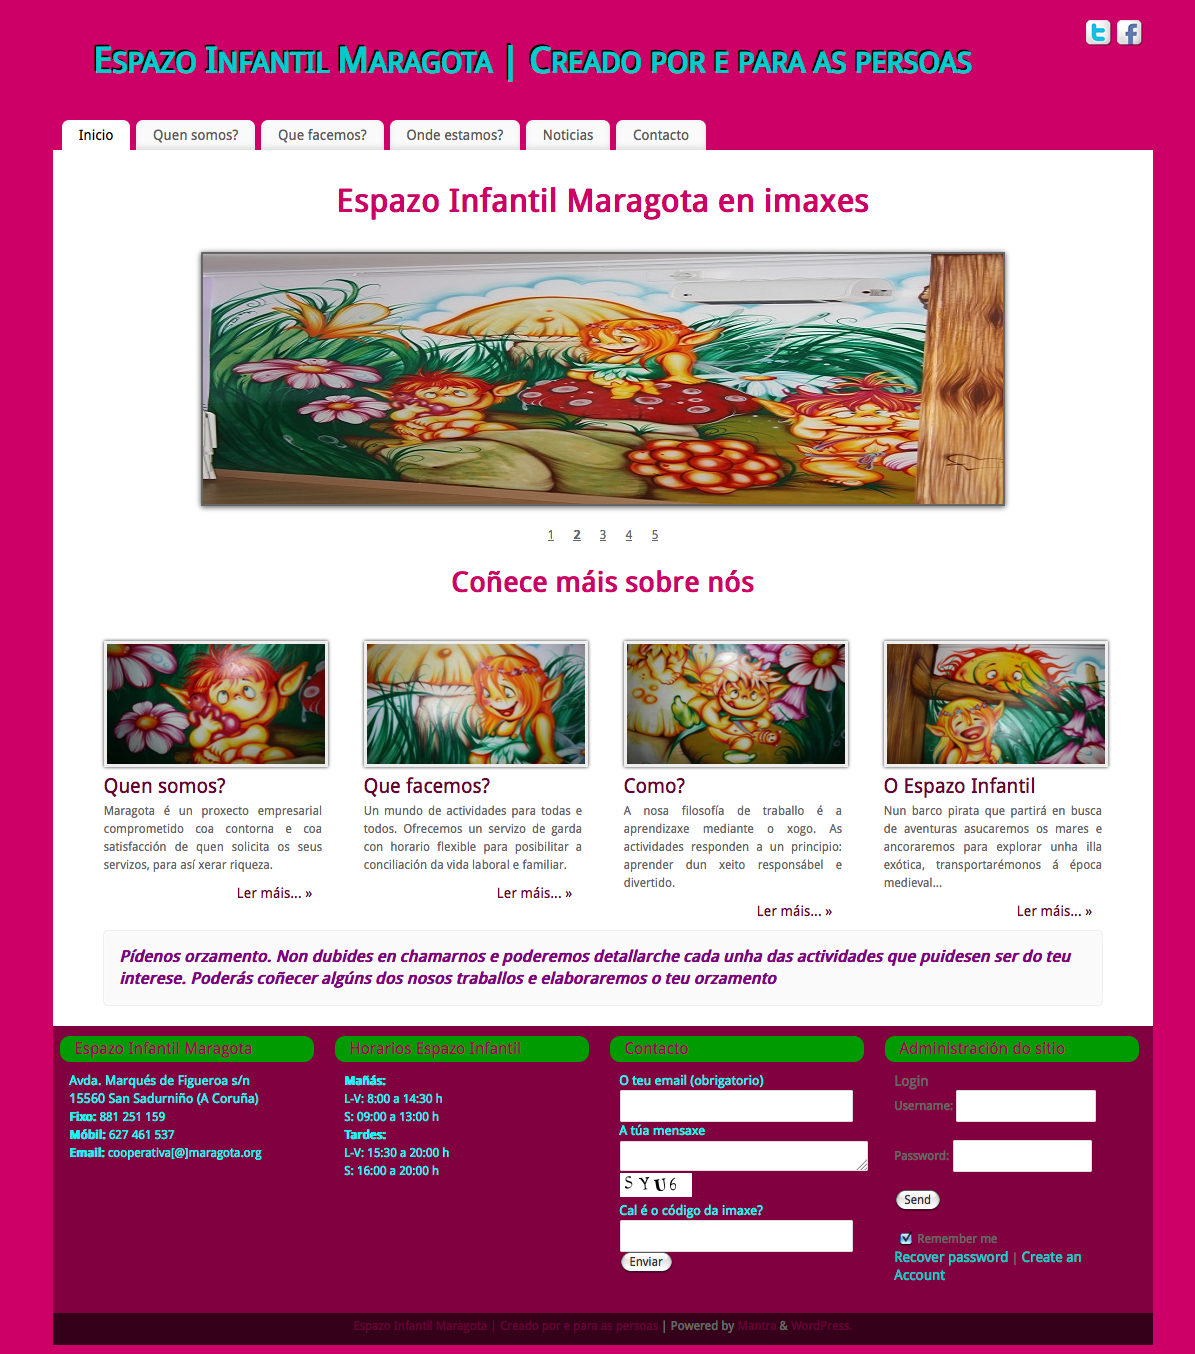 maragota.org